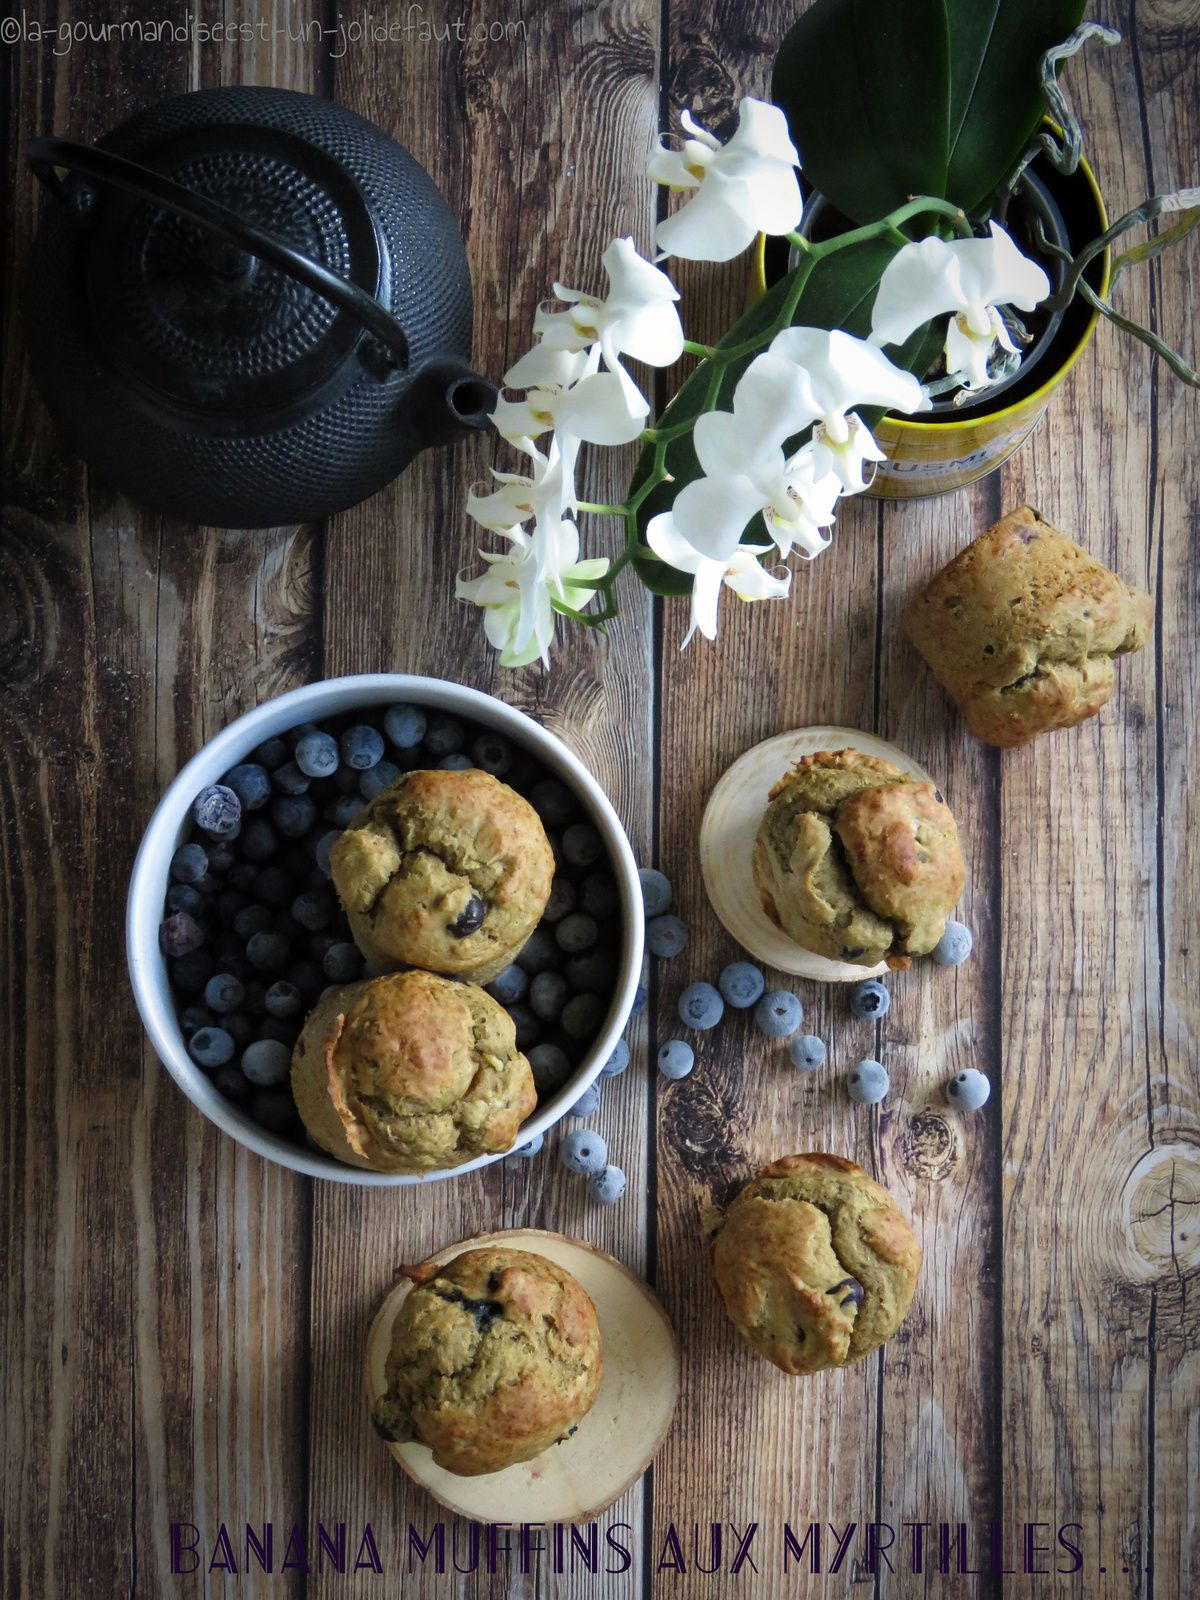 Banana muffins aux myrtilles